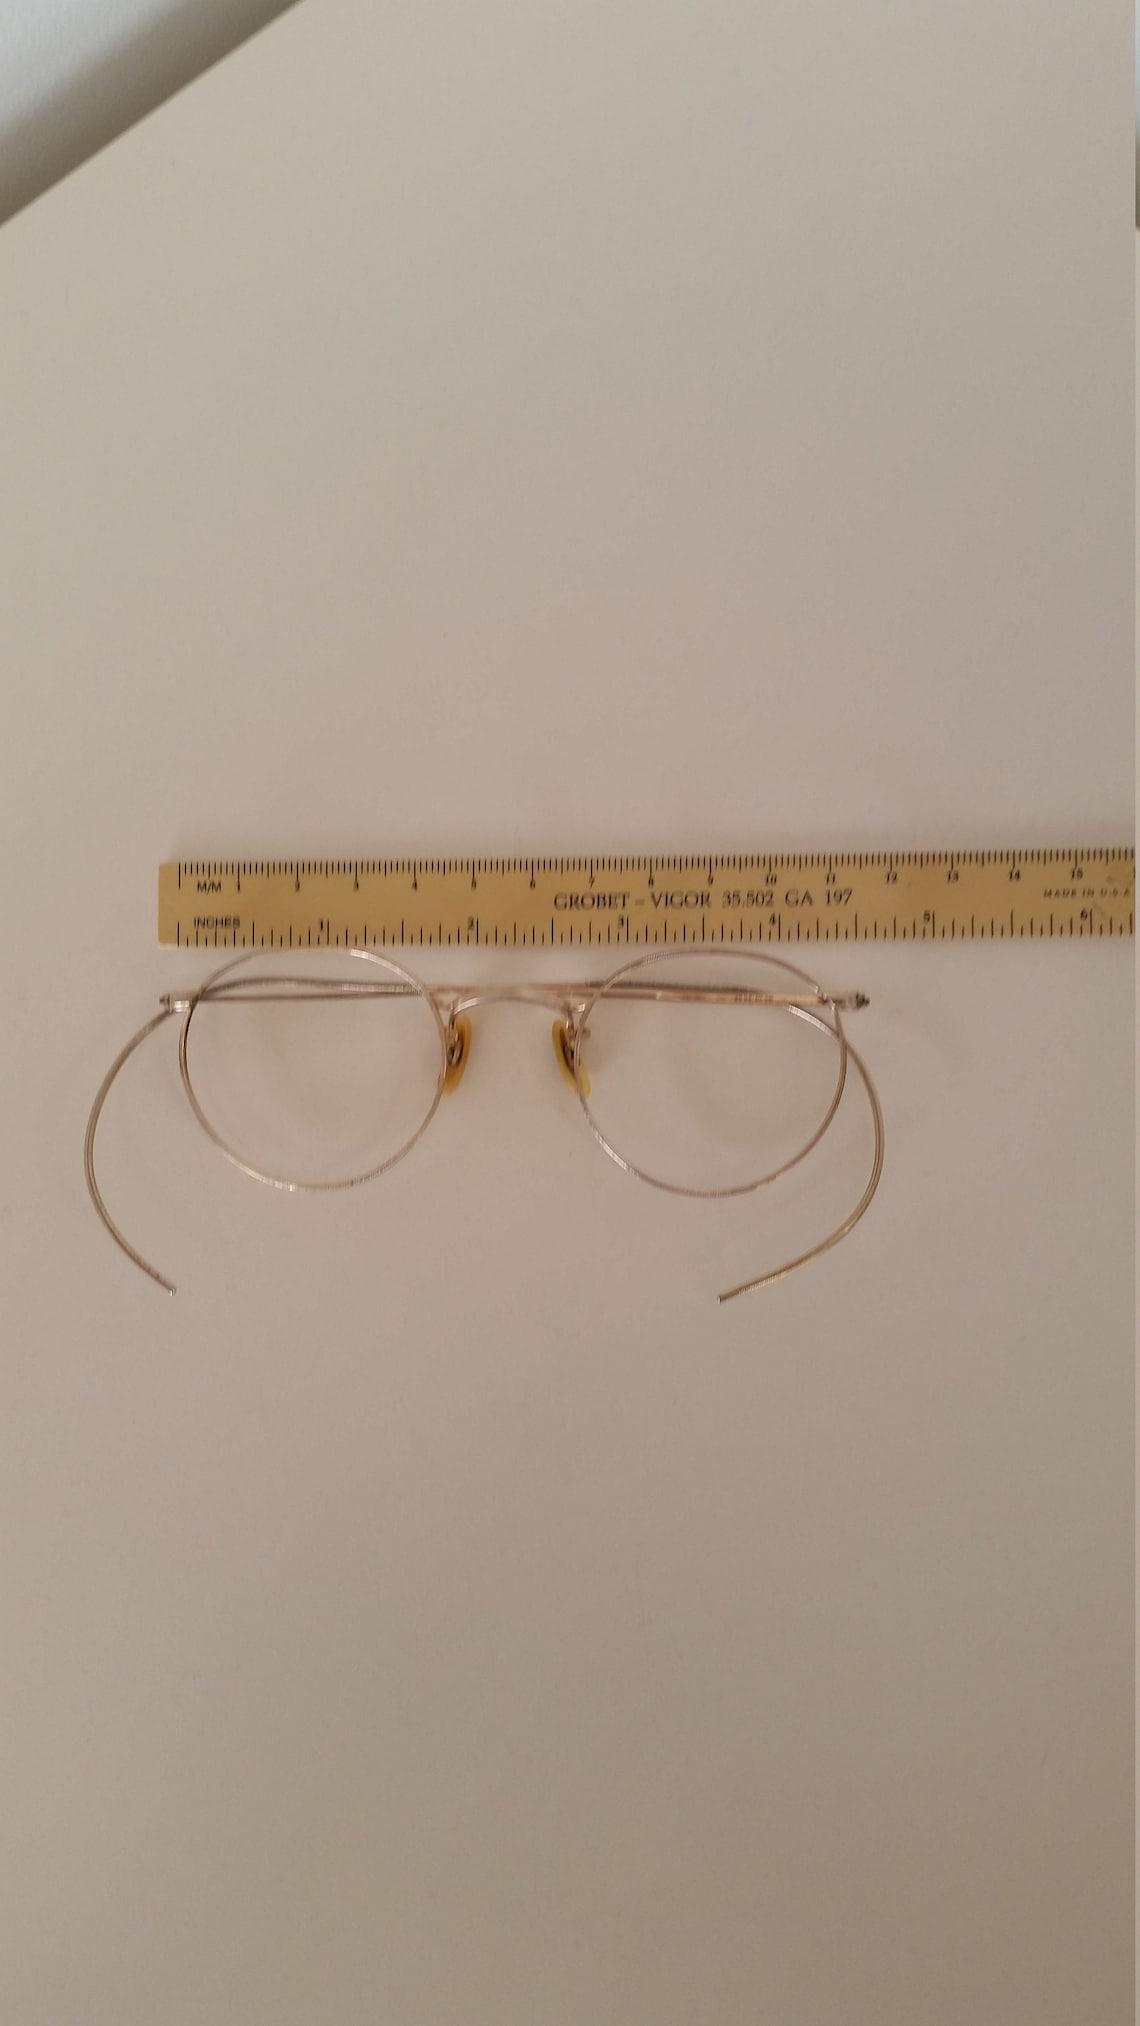 1930s Shuron Ful-Vue Eyeglasses Frame; Marked 1/10 12KGF; Gold Round Metal w/Flex Wrap Temples; Rx-able; Add Your Prescription; Reenactors